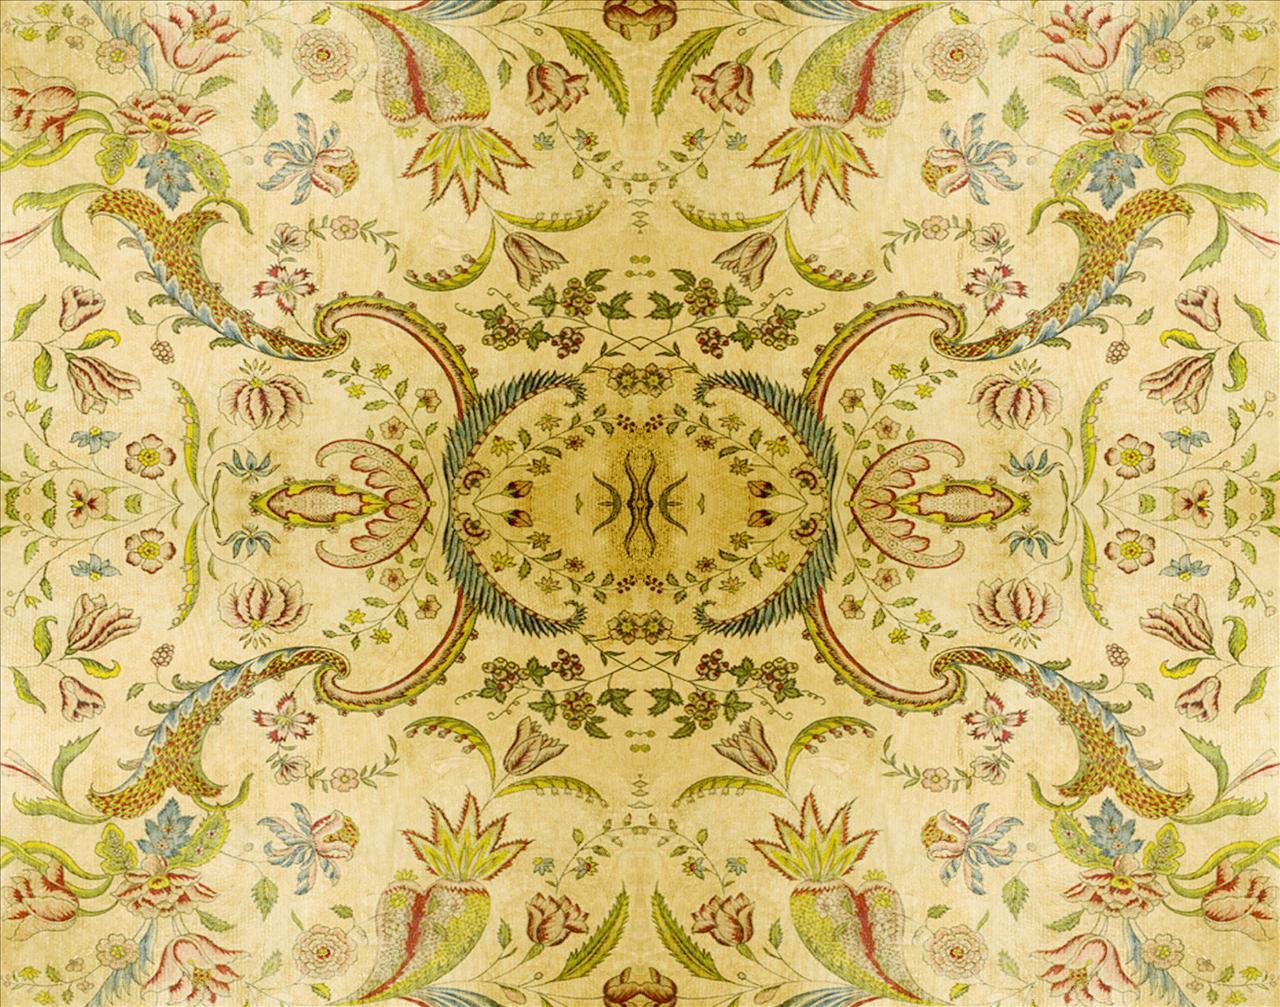 Wunderkammer Wallpaper Patterns 1280x1007